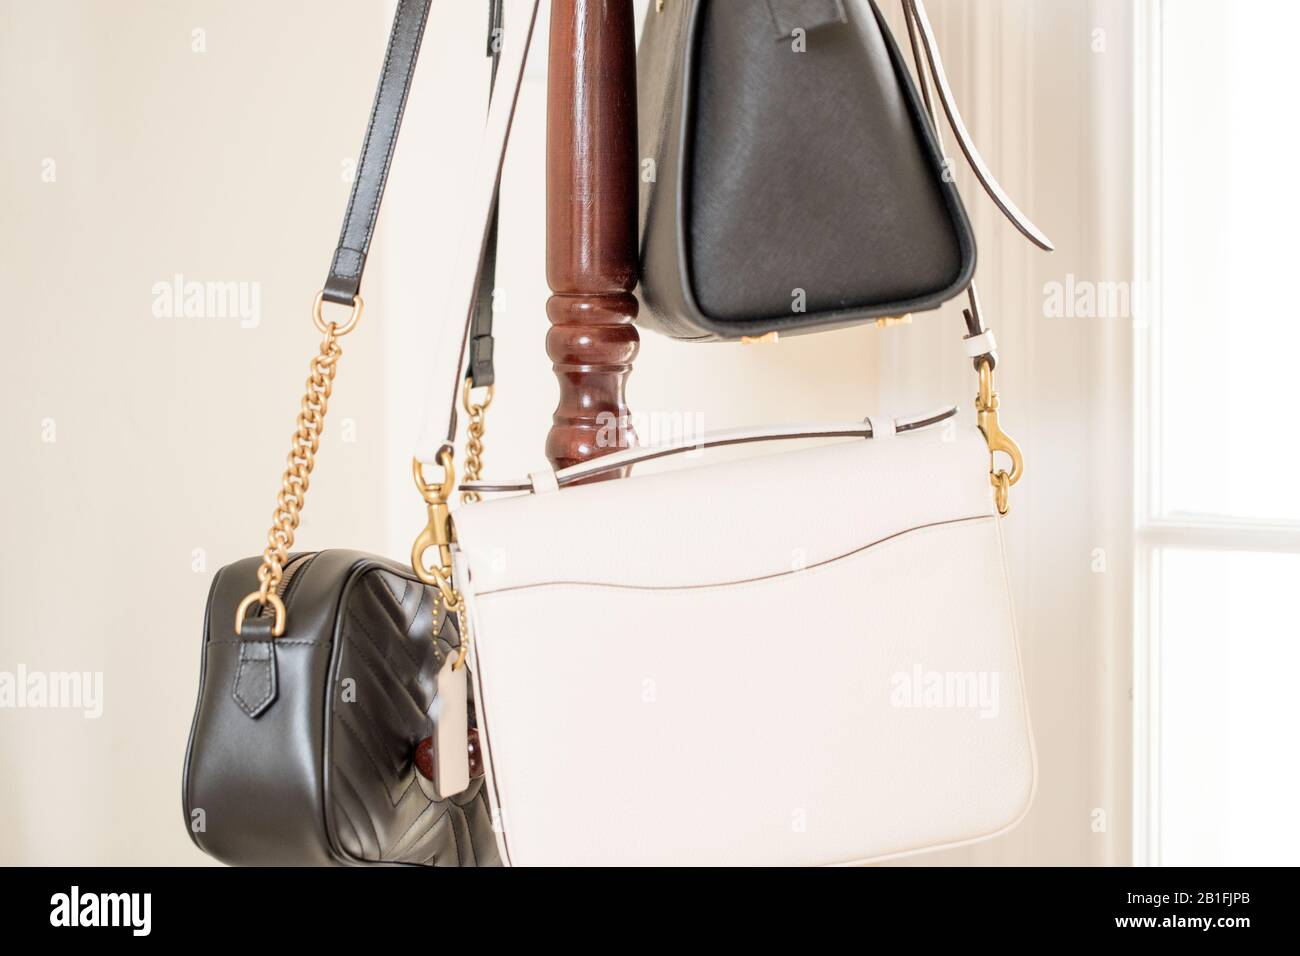 handbag is hanging brown shelf - Image Stock Photo